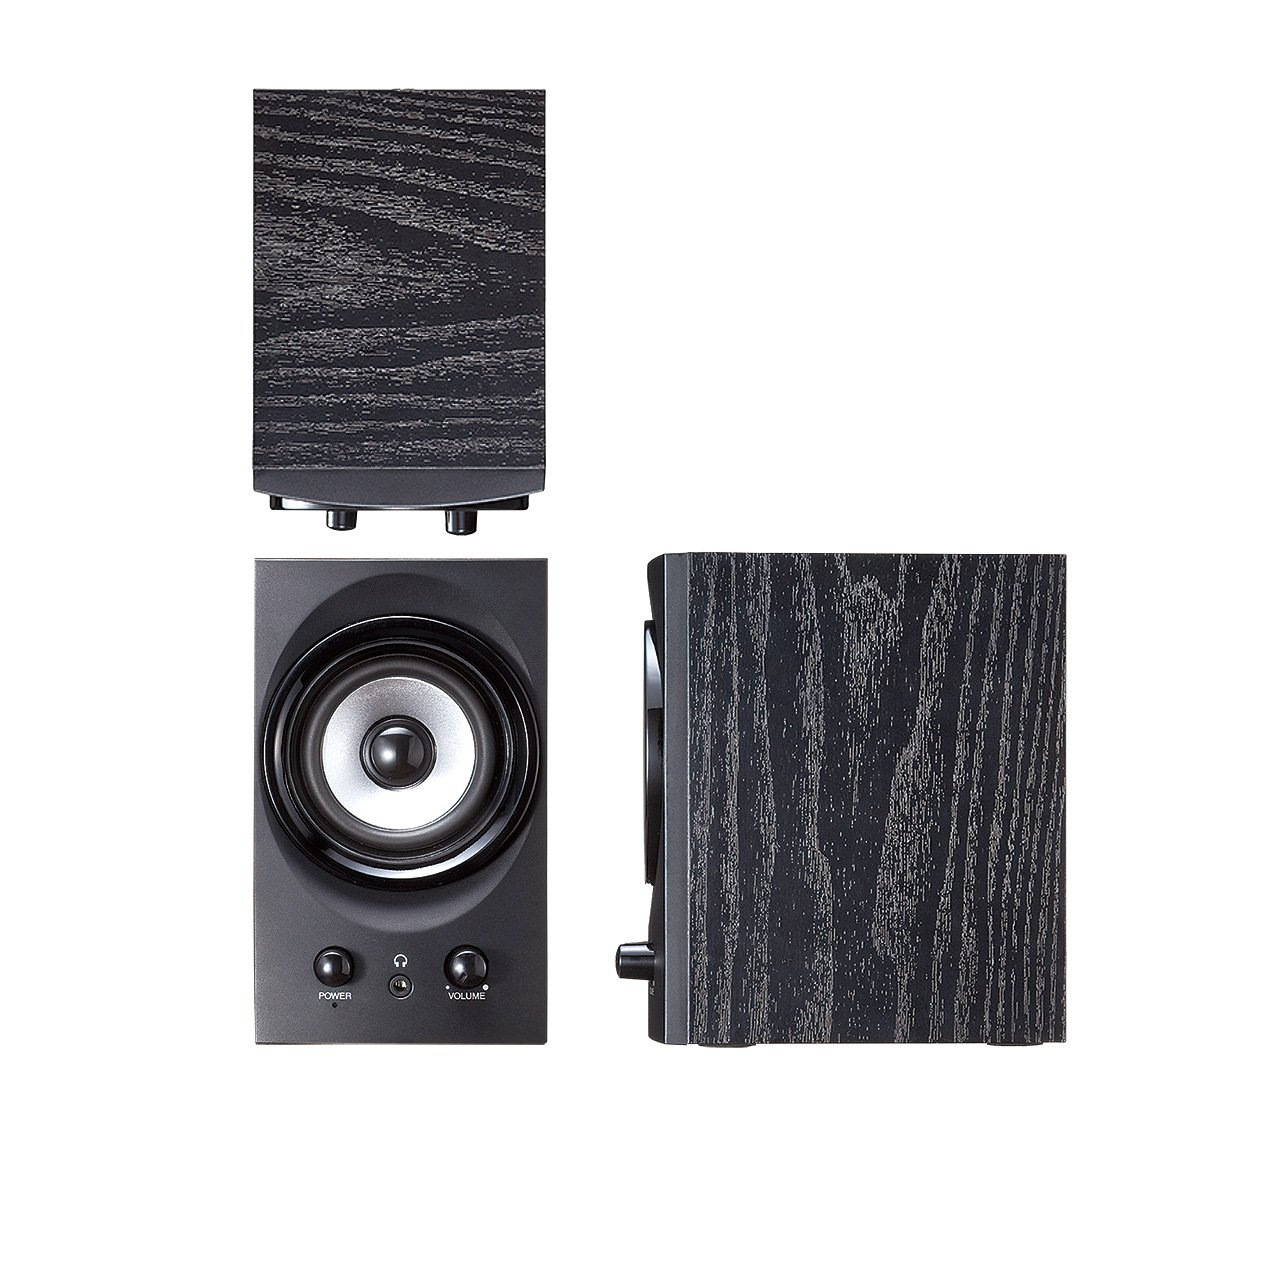 SANWA SUPPLY high-power USB speaker MM-SPU9BK (Black) by Sanwa (Image #10)